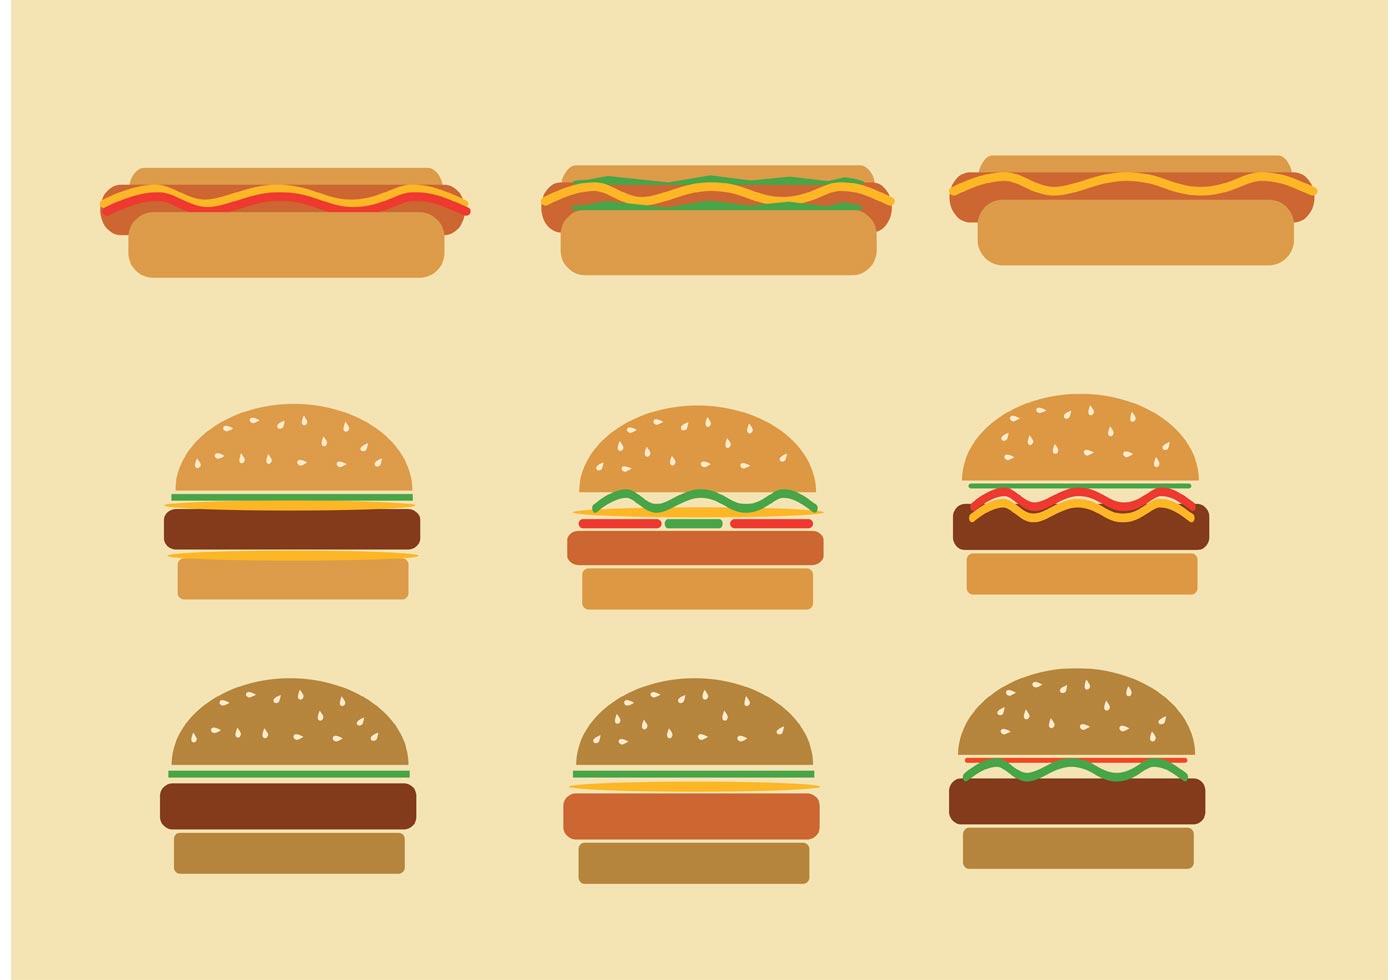 Fast Food Set Menu Yellow Gradient Background Fast Food: Fast Food Hamburgers And Hot Dog Vectors